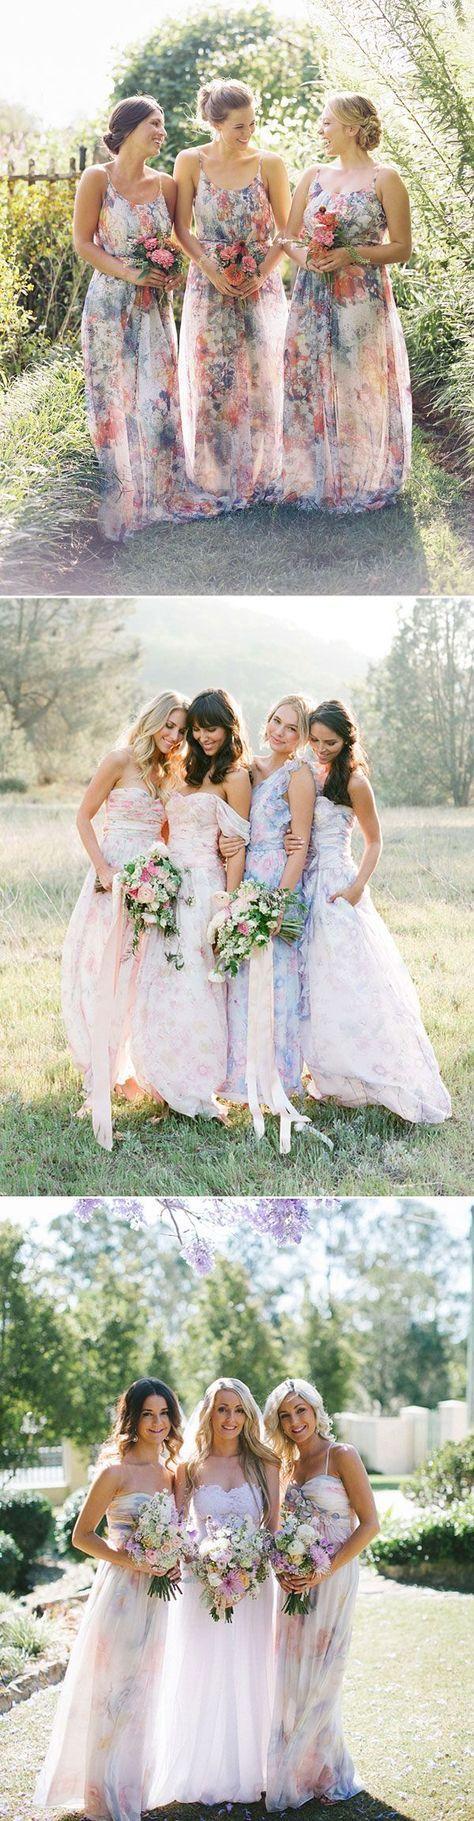 Top 6 Bridesmaid Dress Trends for Fall Wedding 2015   http://www.tulleandchantilly.com/blog/top-6-bridesmaid-dress-trends-for-fall-wedding-2015/